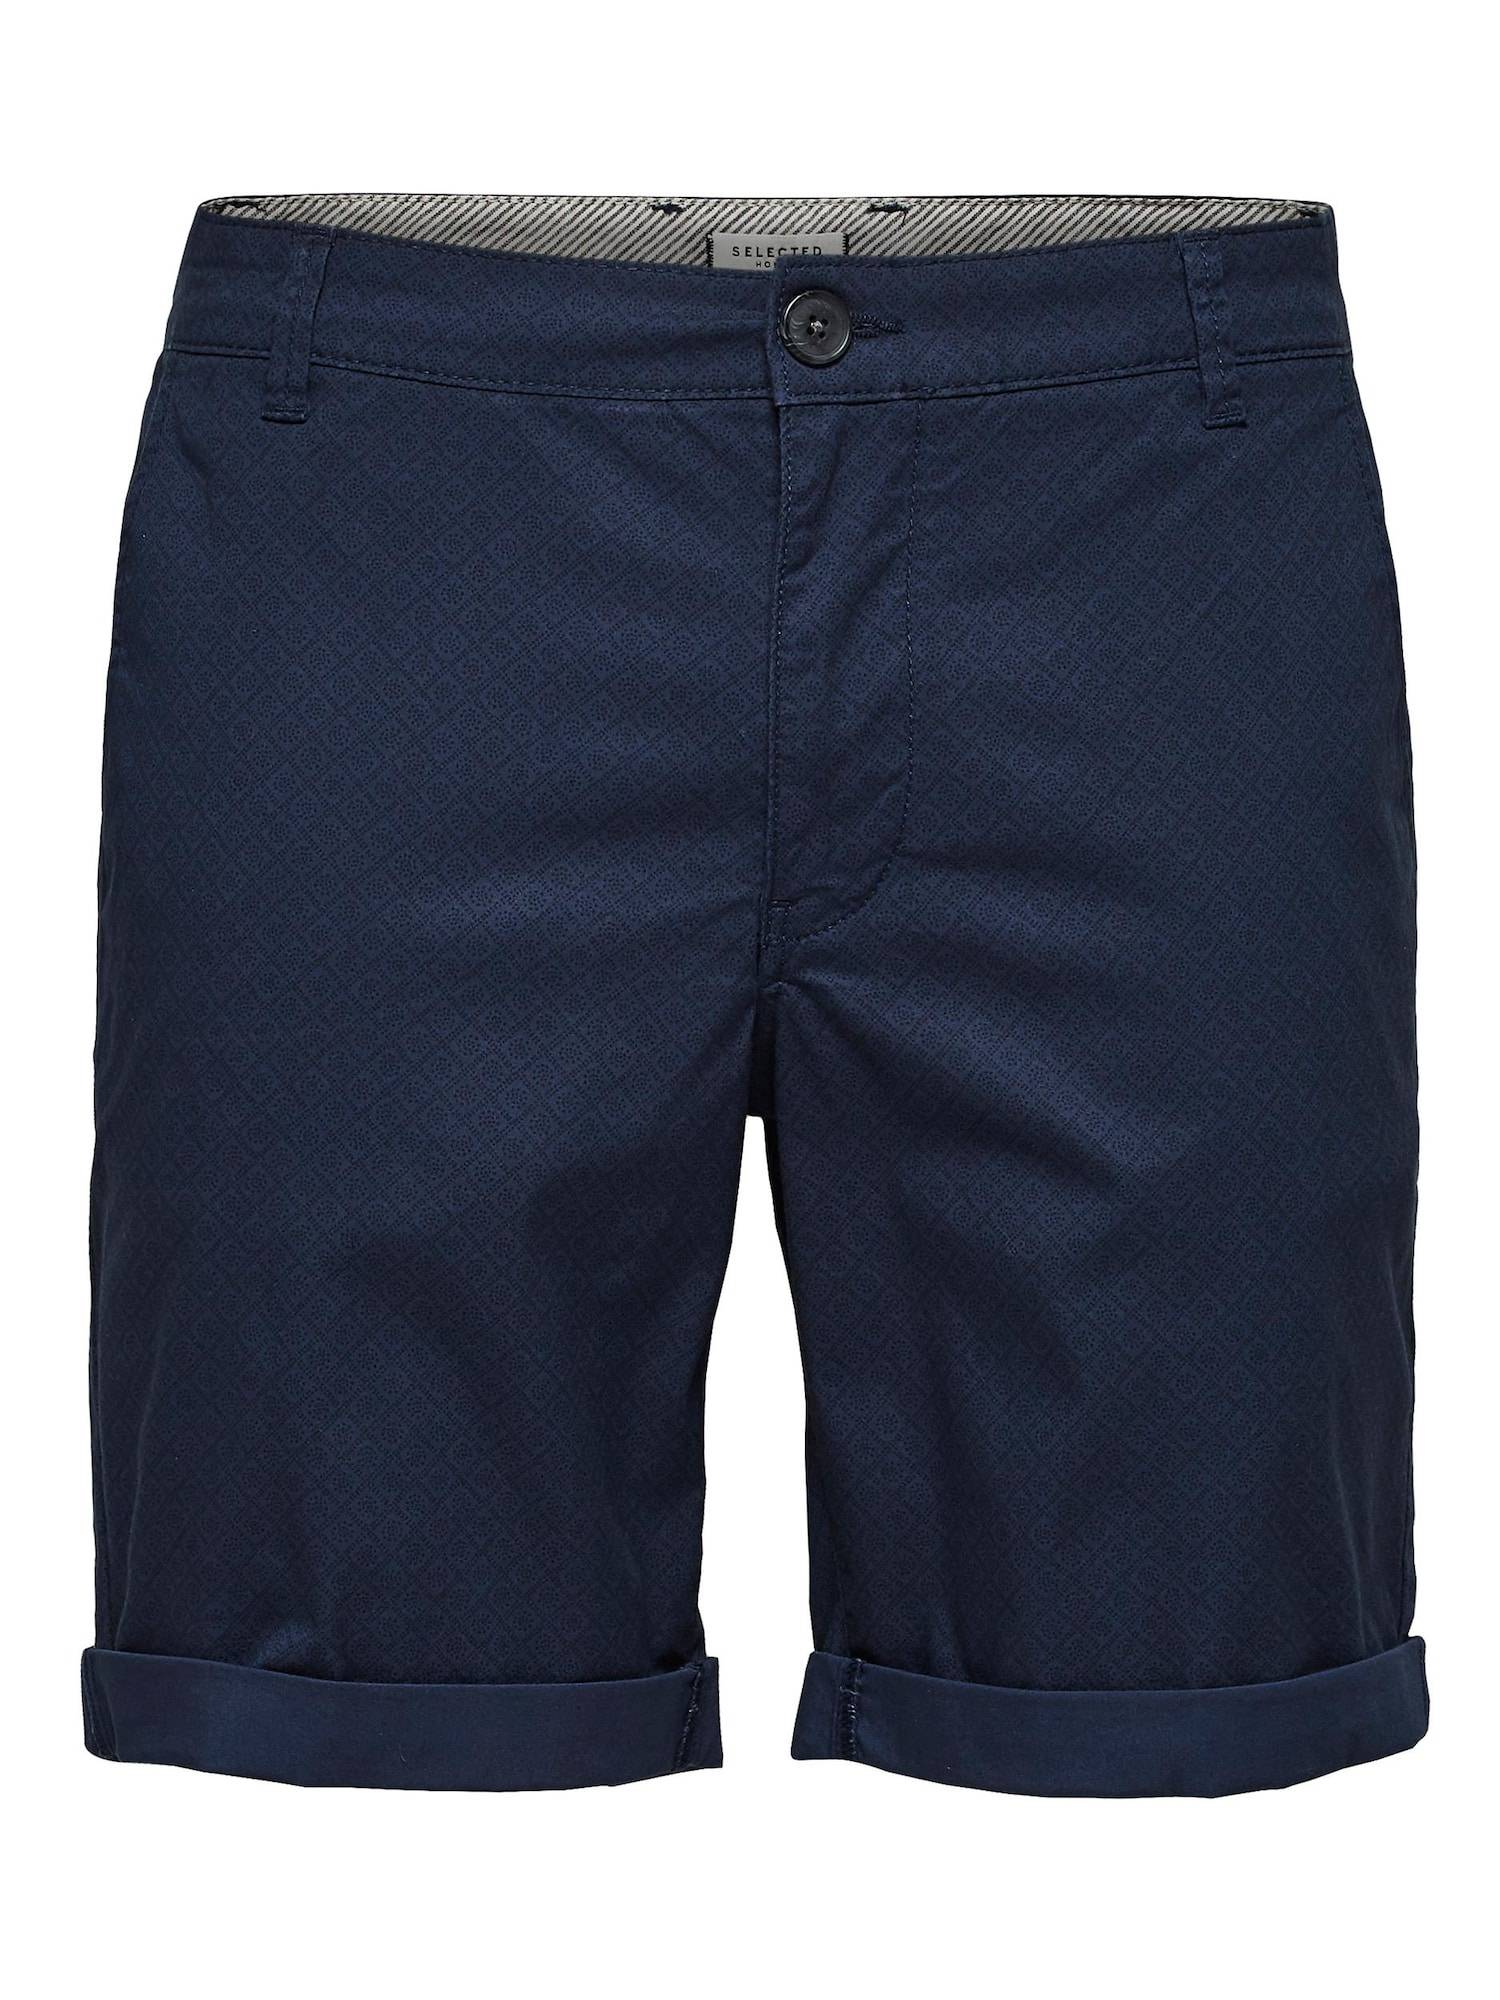 SELECTED HOMME Pantalon chino 'Paris'  - Bleu - Taille: S - male